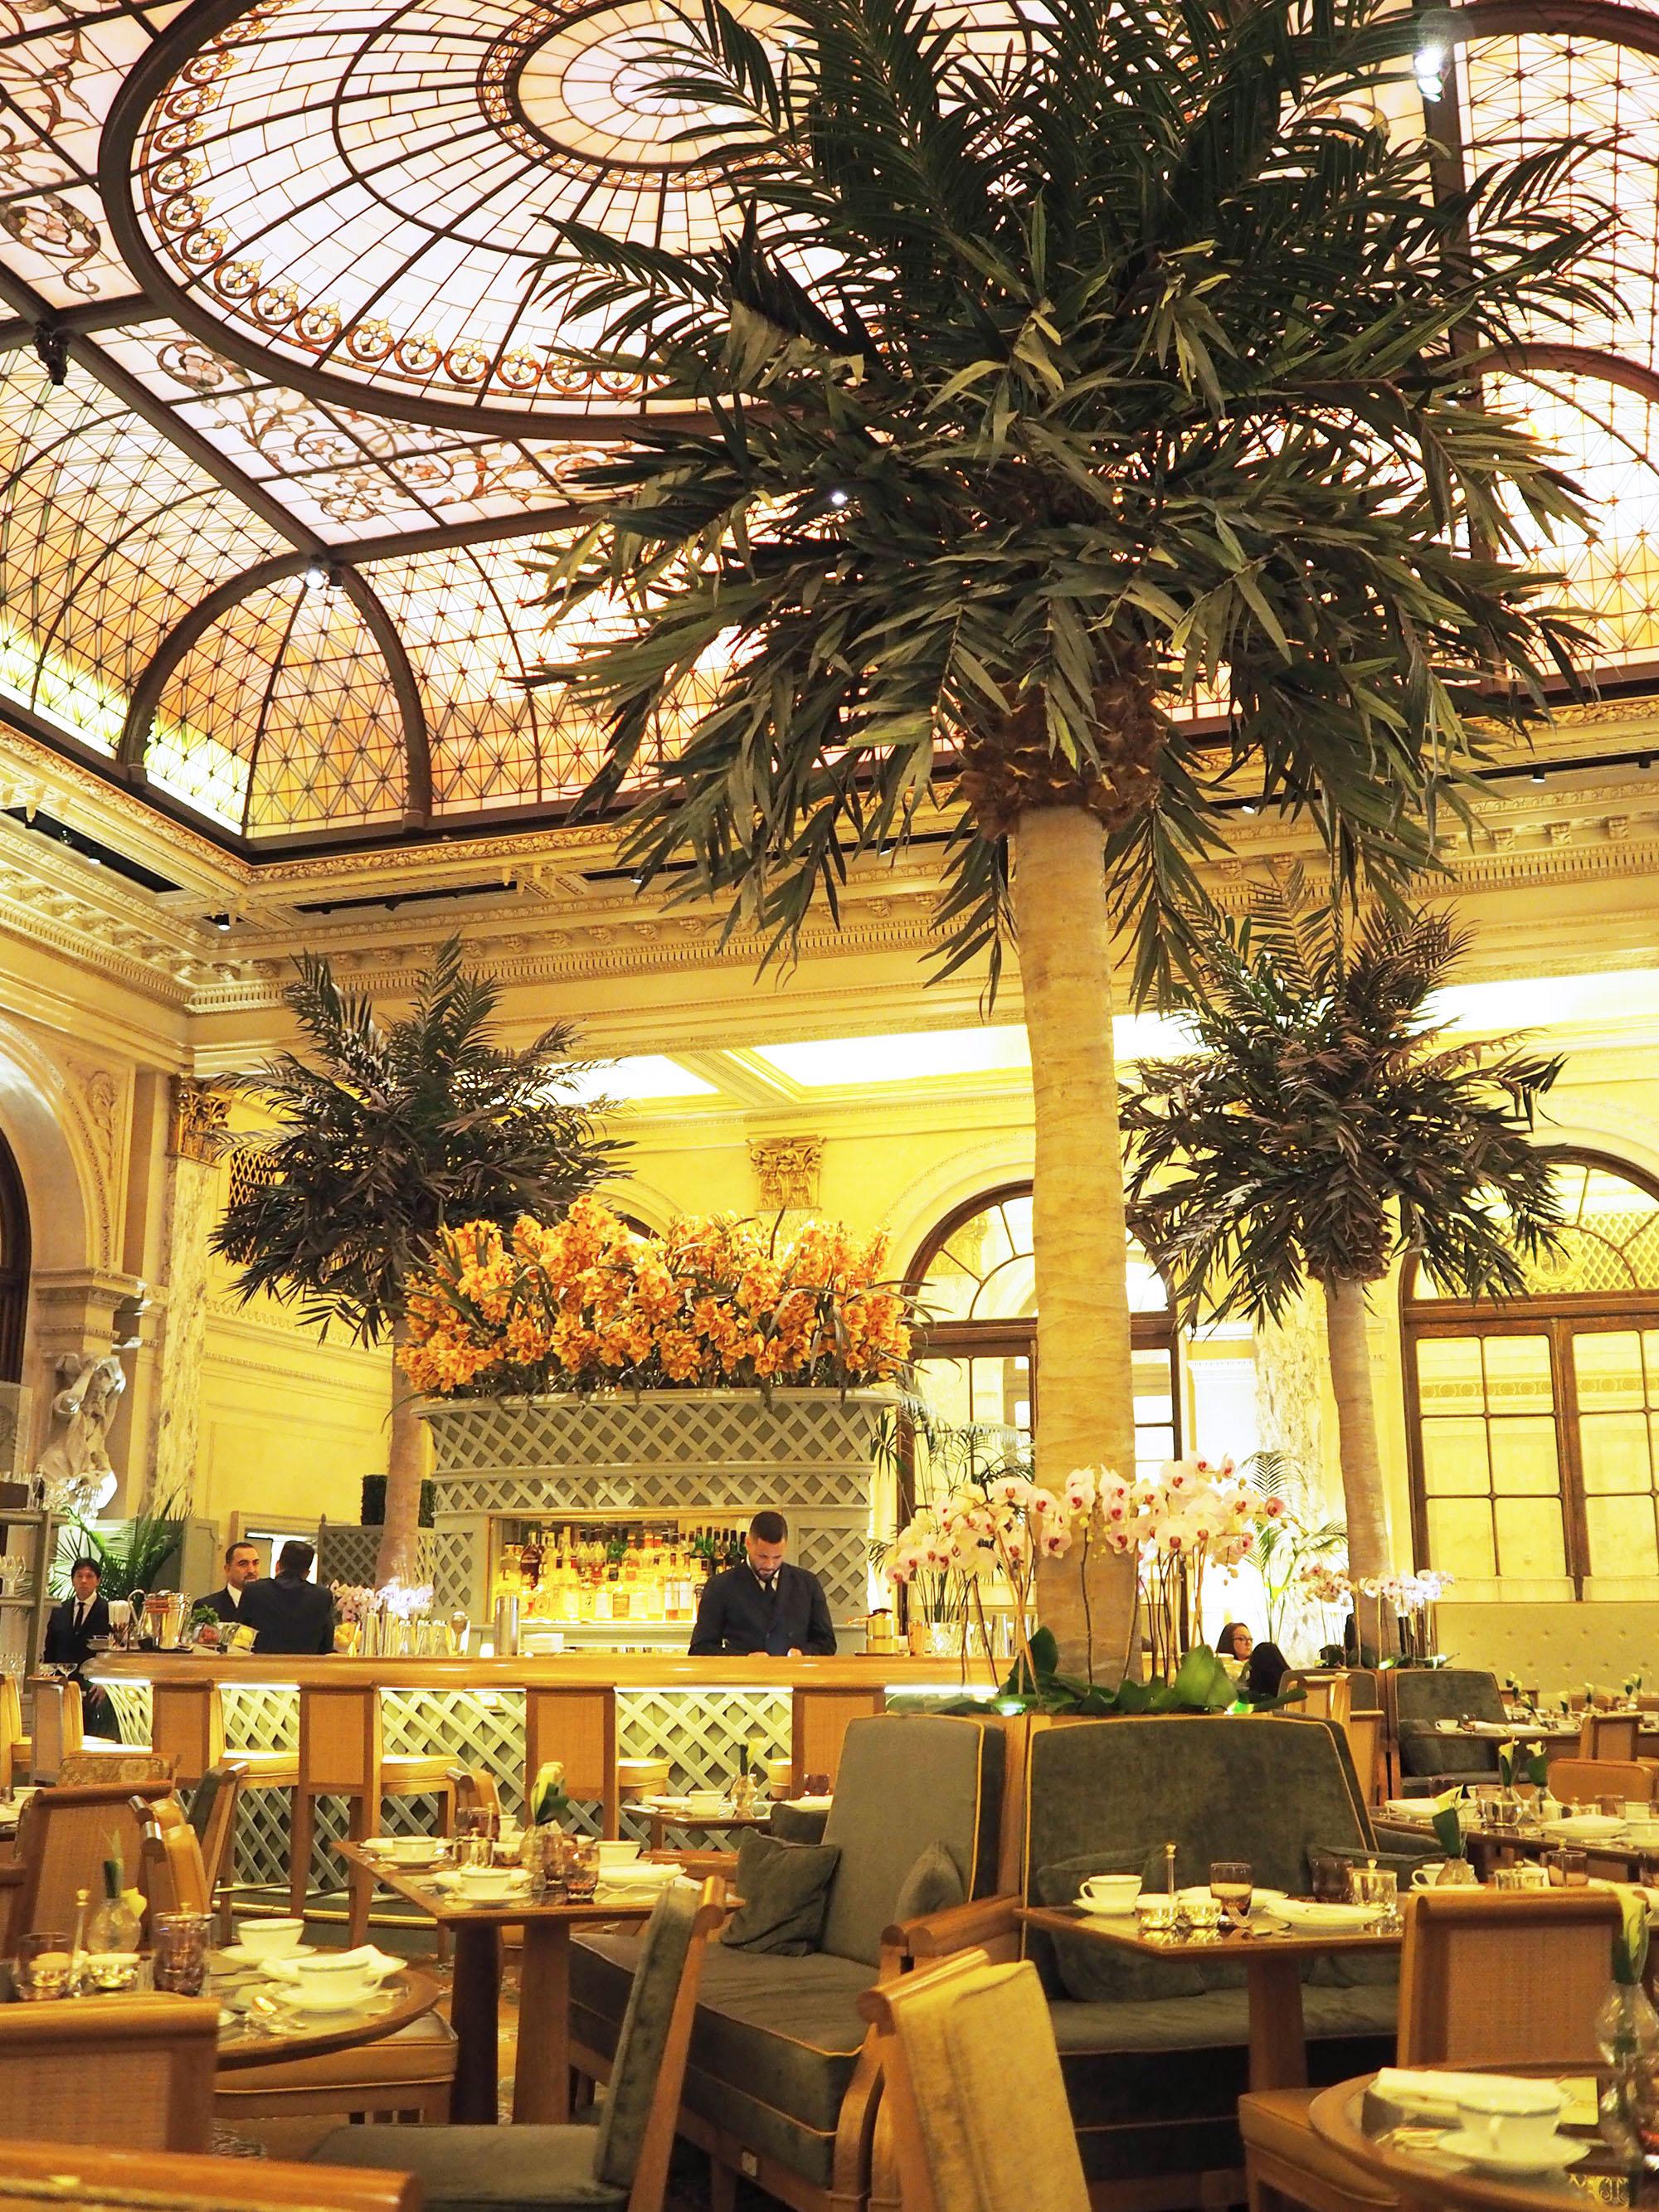 afternoon tea at the plaza hotel new york dreams of velvet. Black Bedroom Furniture Sets. Home Design Ideas